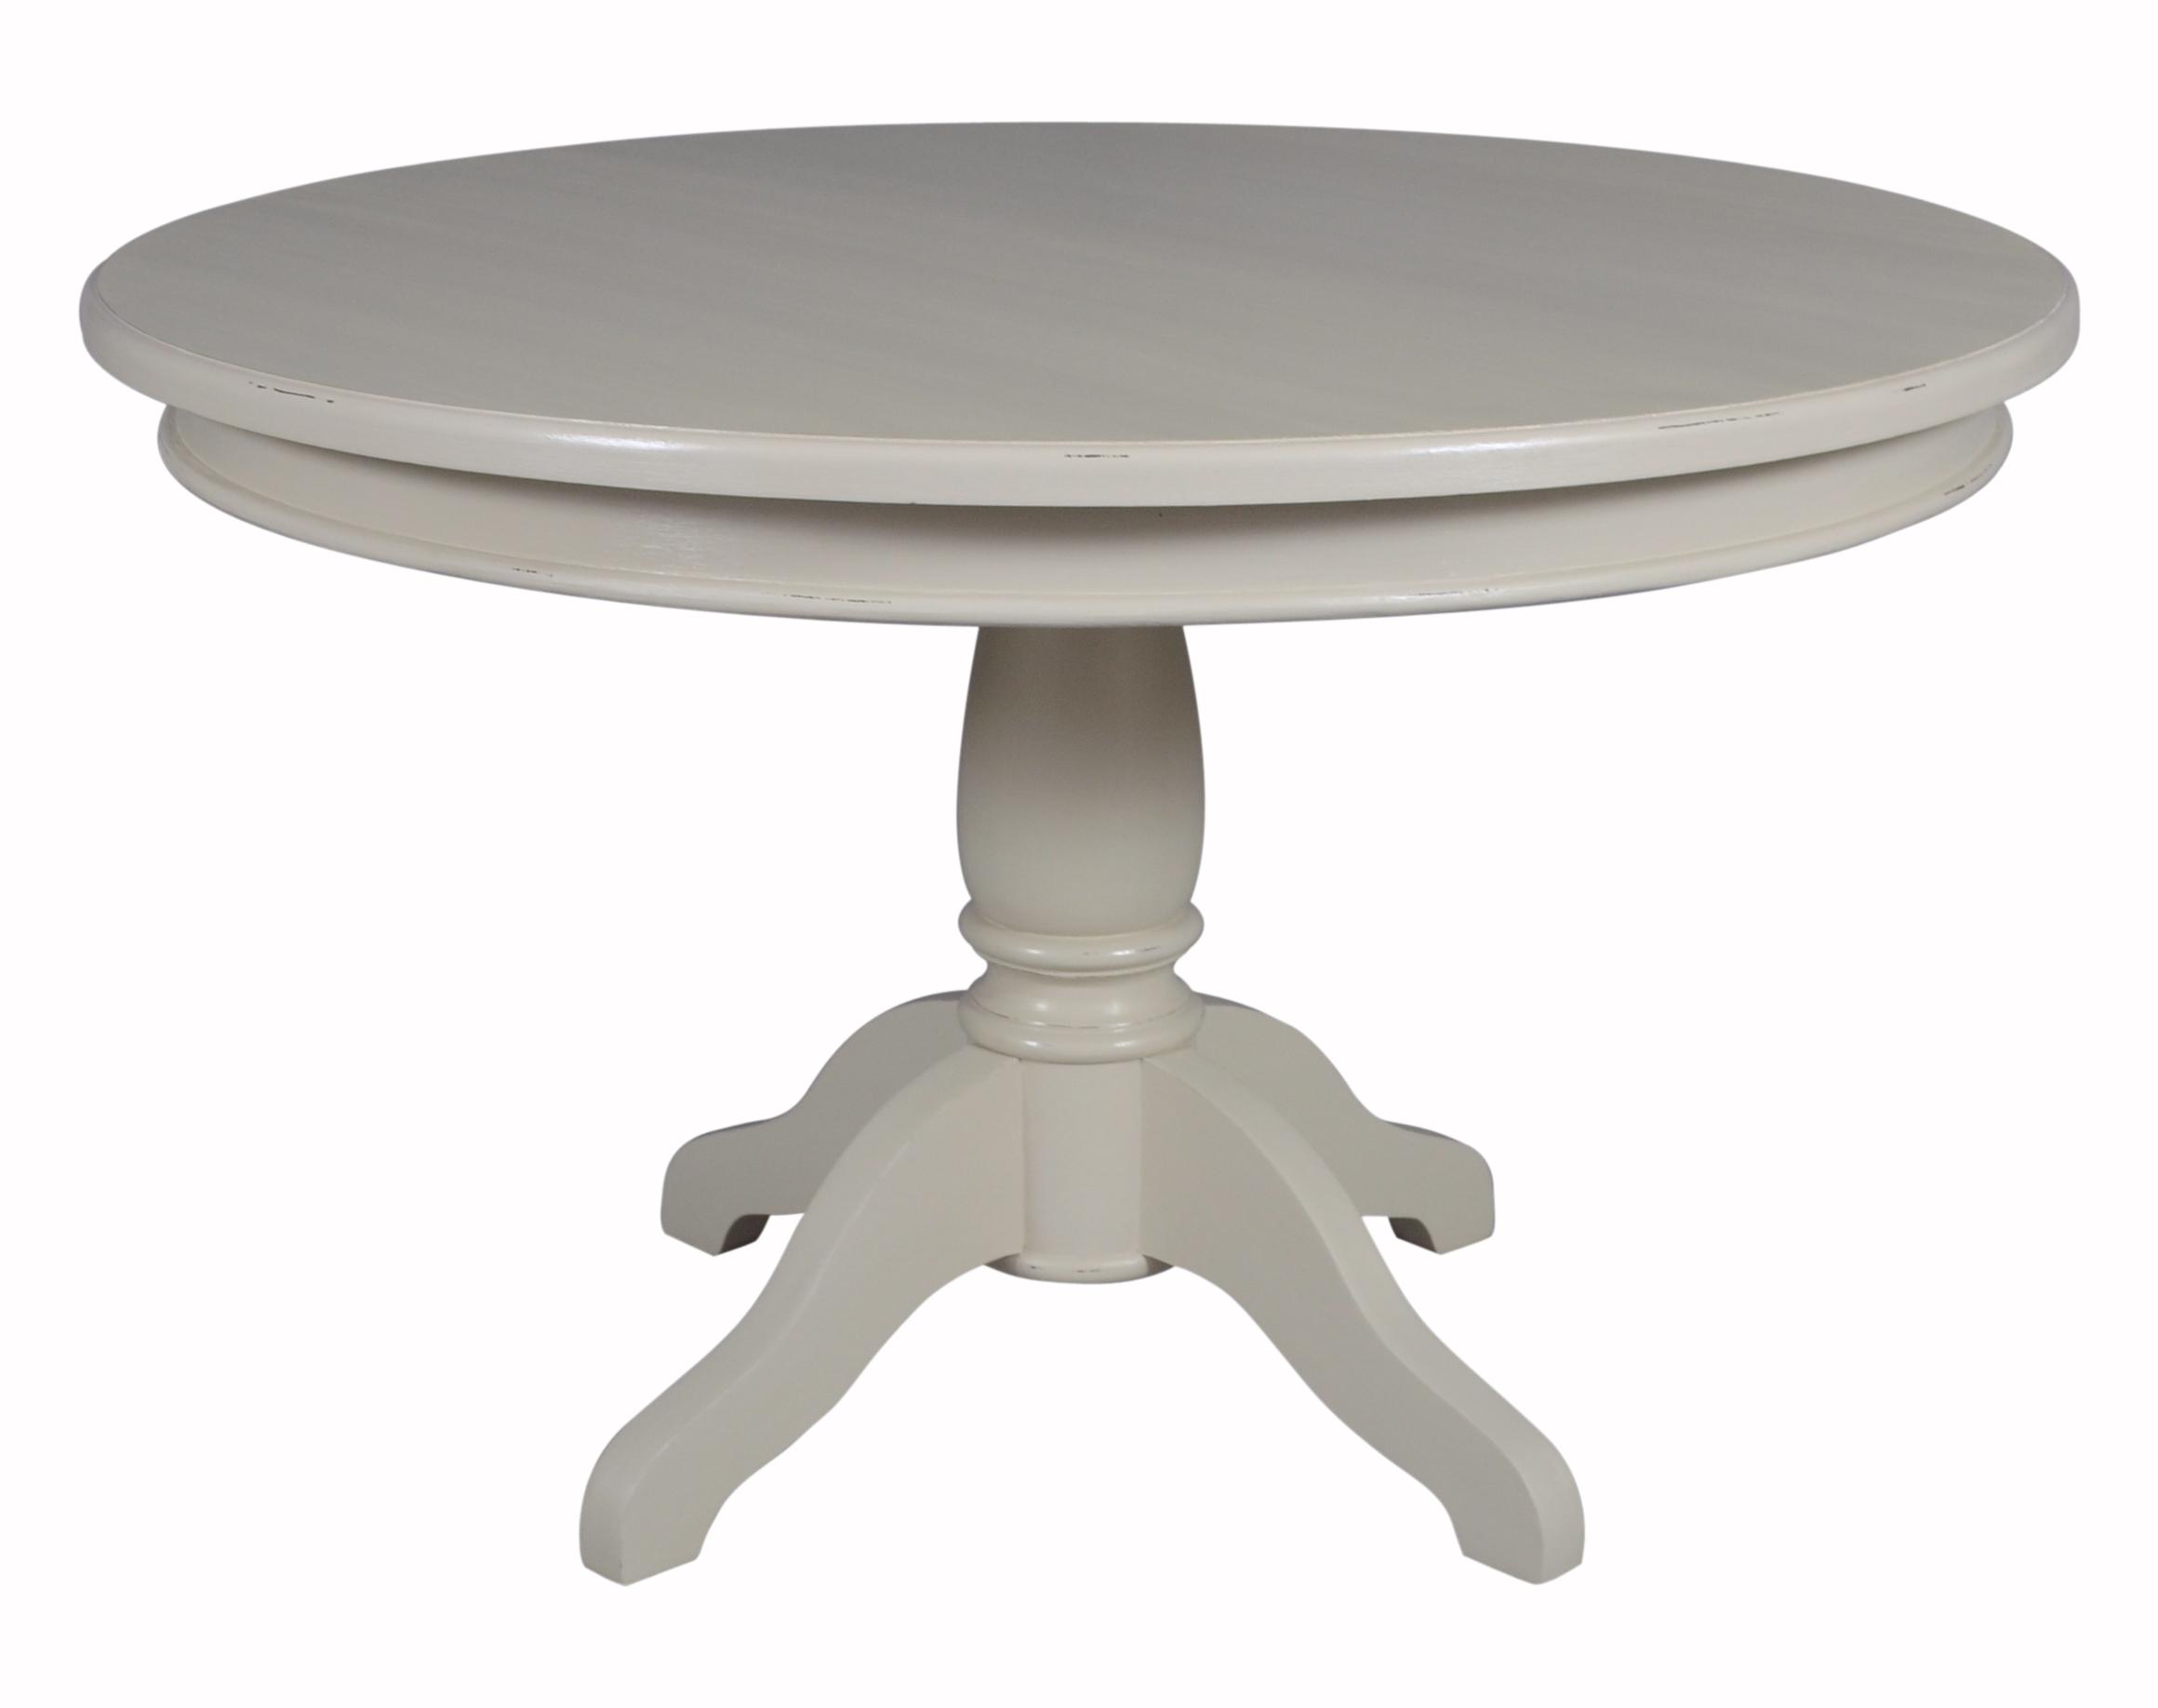 Bellaford Round Pedestal Dining Table